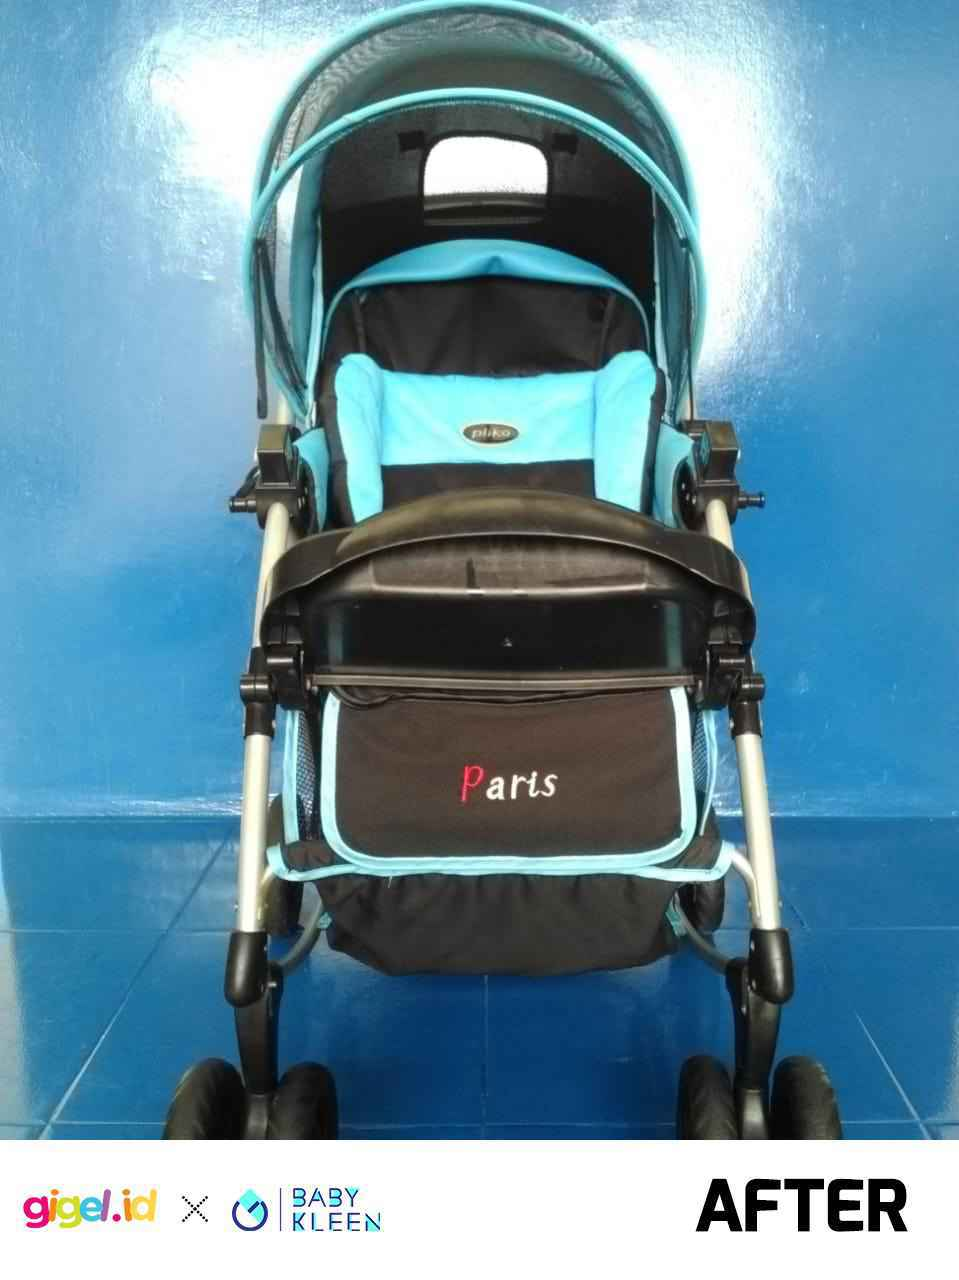 GIGEL.ID x Baby Kleen Laundry Stroller - 4